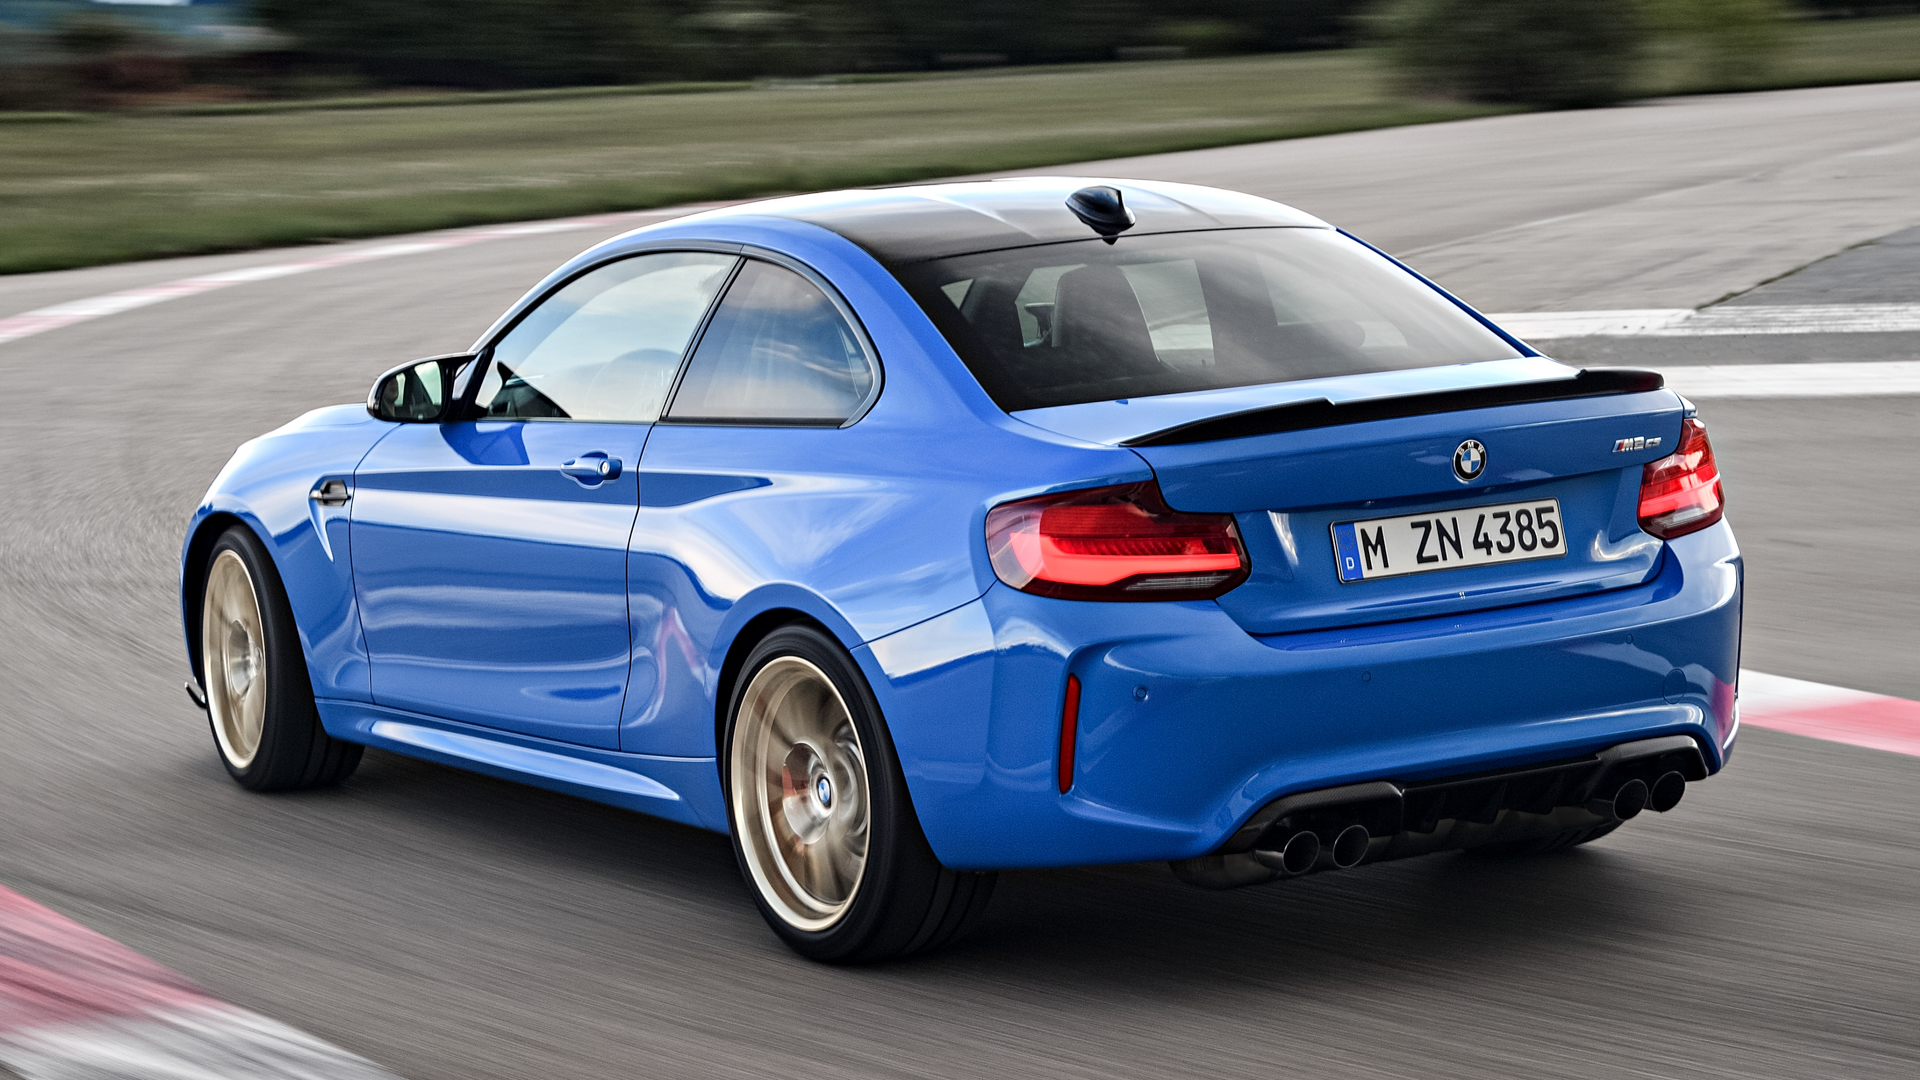 BMW M2 CS M2 Comp Comparisons 10 of 12